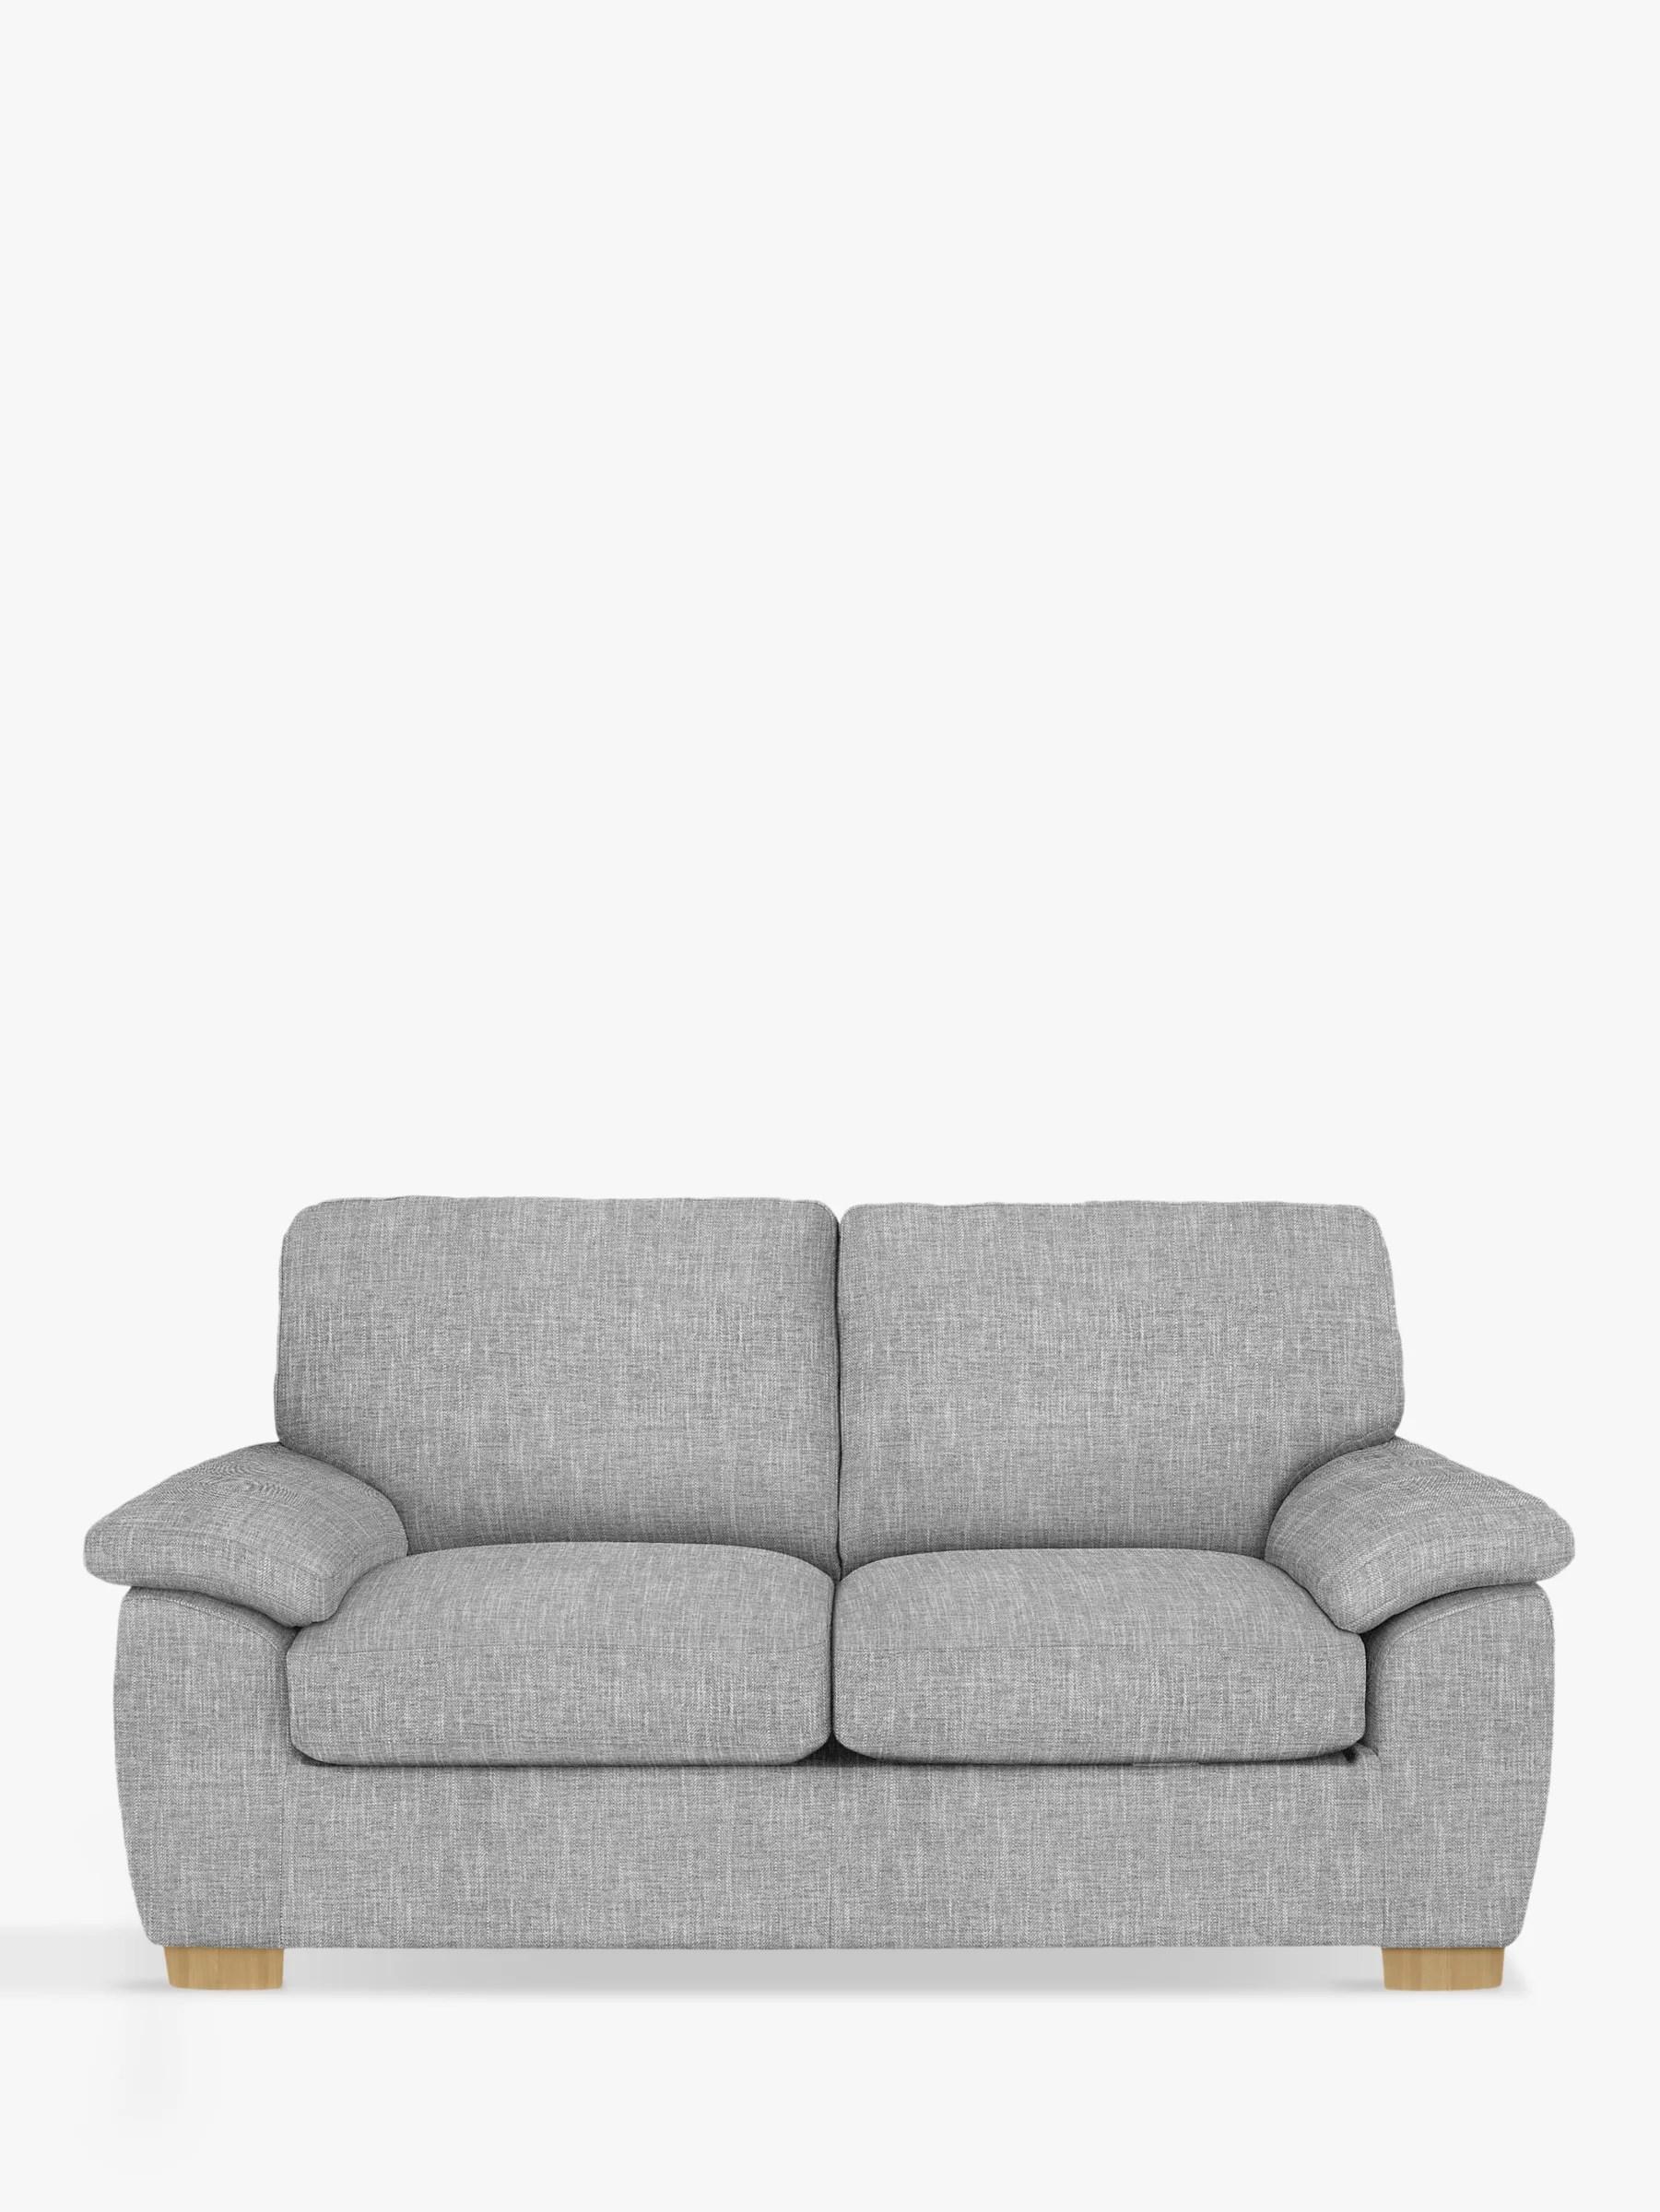 camden sofa john lewis l shaped fabric malaysia energywarden